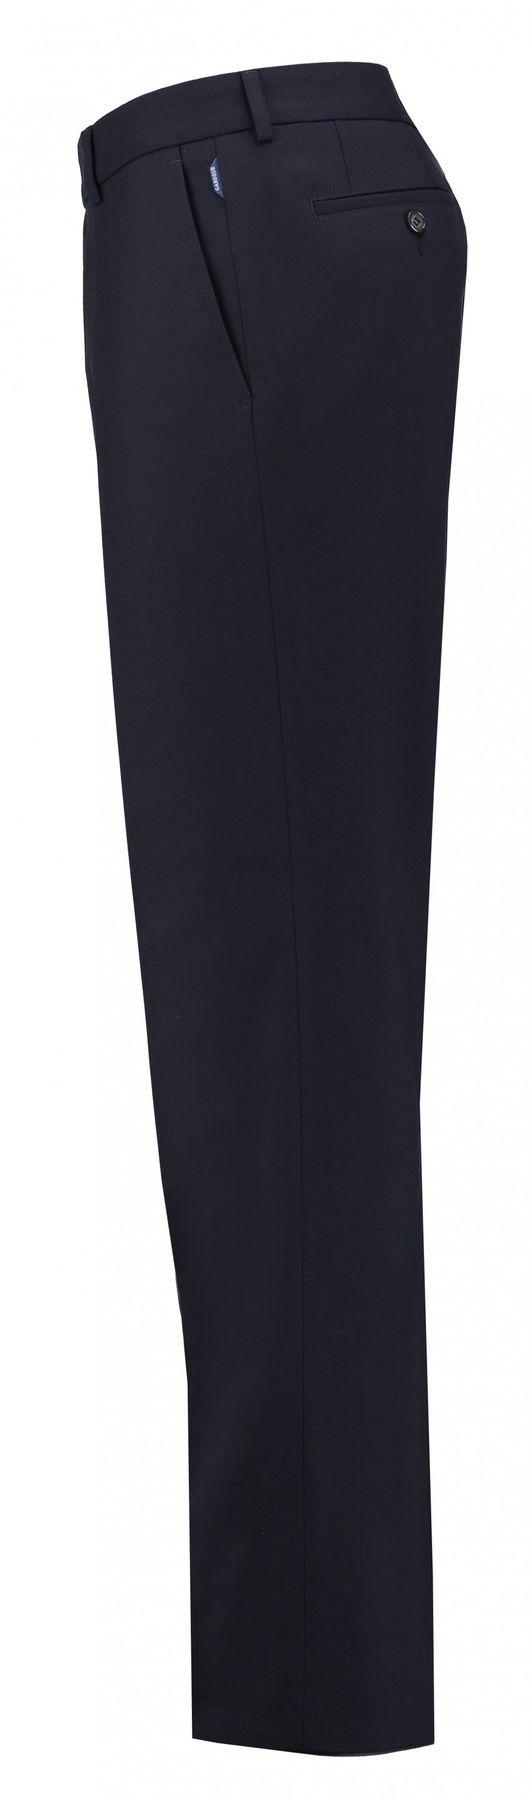 Atelier Gardeur - Regular Fit - Herren Flatfront Wollhose, Farben Marine, Anthrazit, Black, Nino (11710) – Bild 3